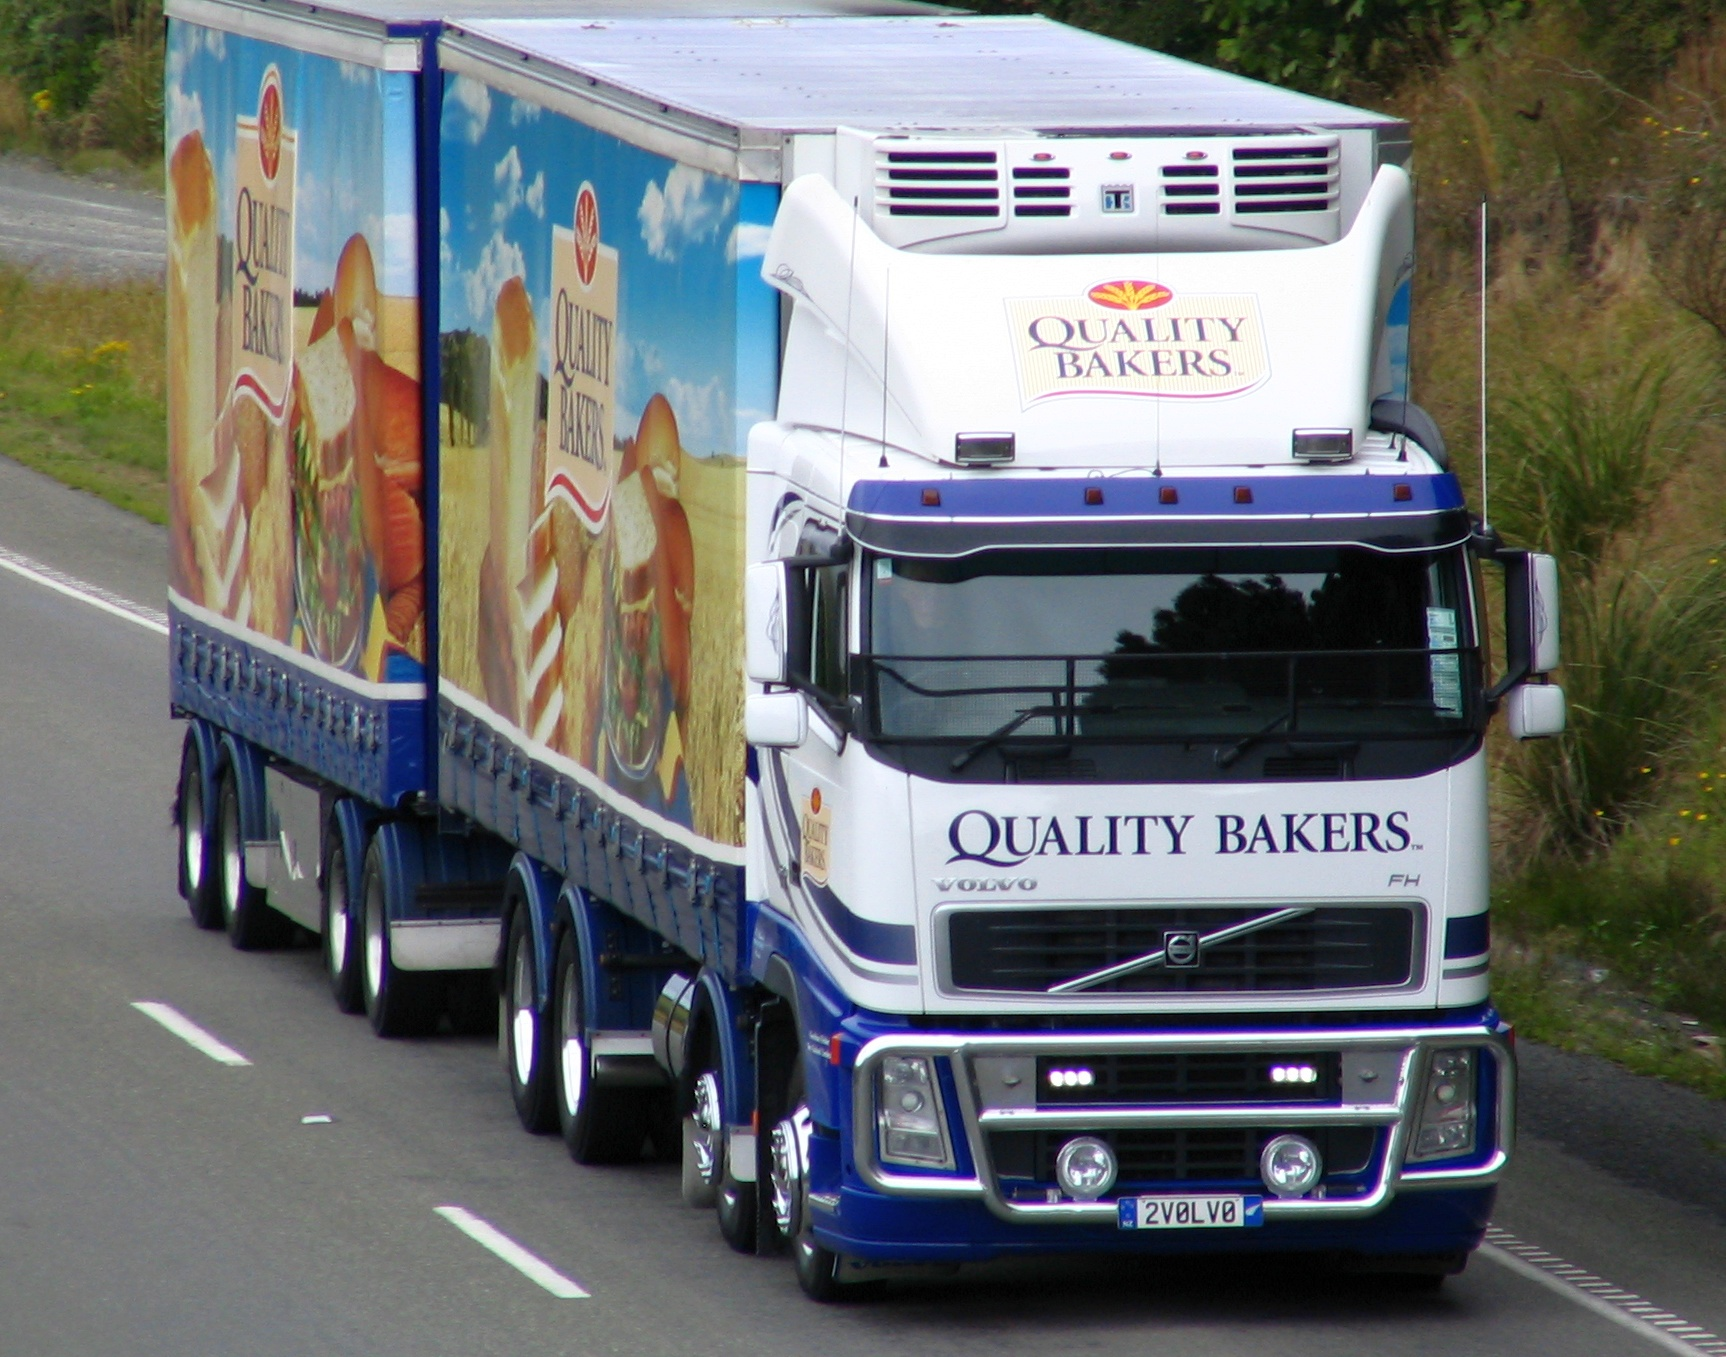 Filequality bakers truck sh1 near dunedin new zealand jpg